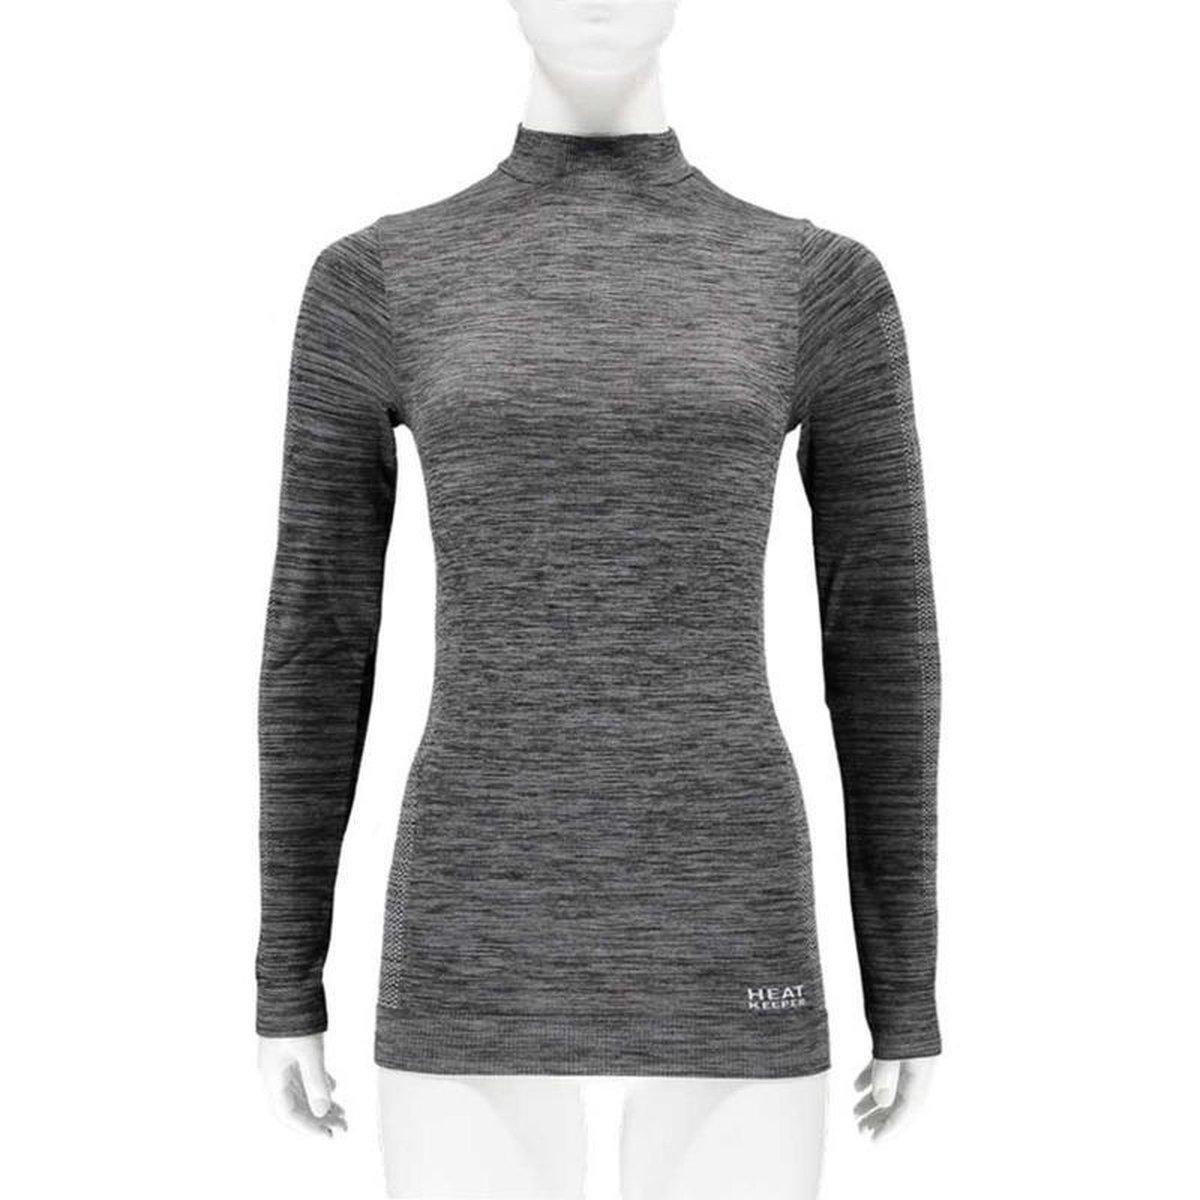 Thermo shirt zwart melange lange mouwen voor dames - Wintersport kleding - Thermokleding - Lange mouw shirt L (40)